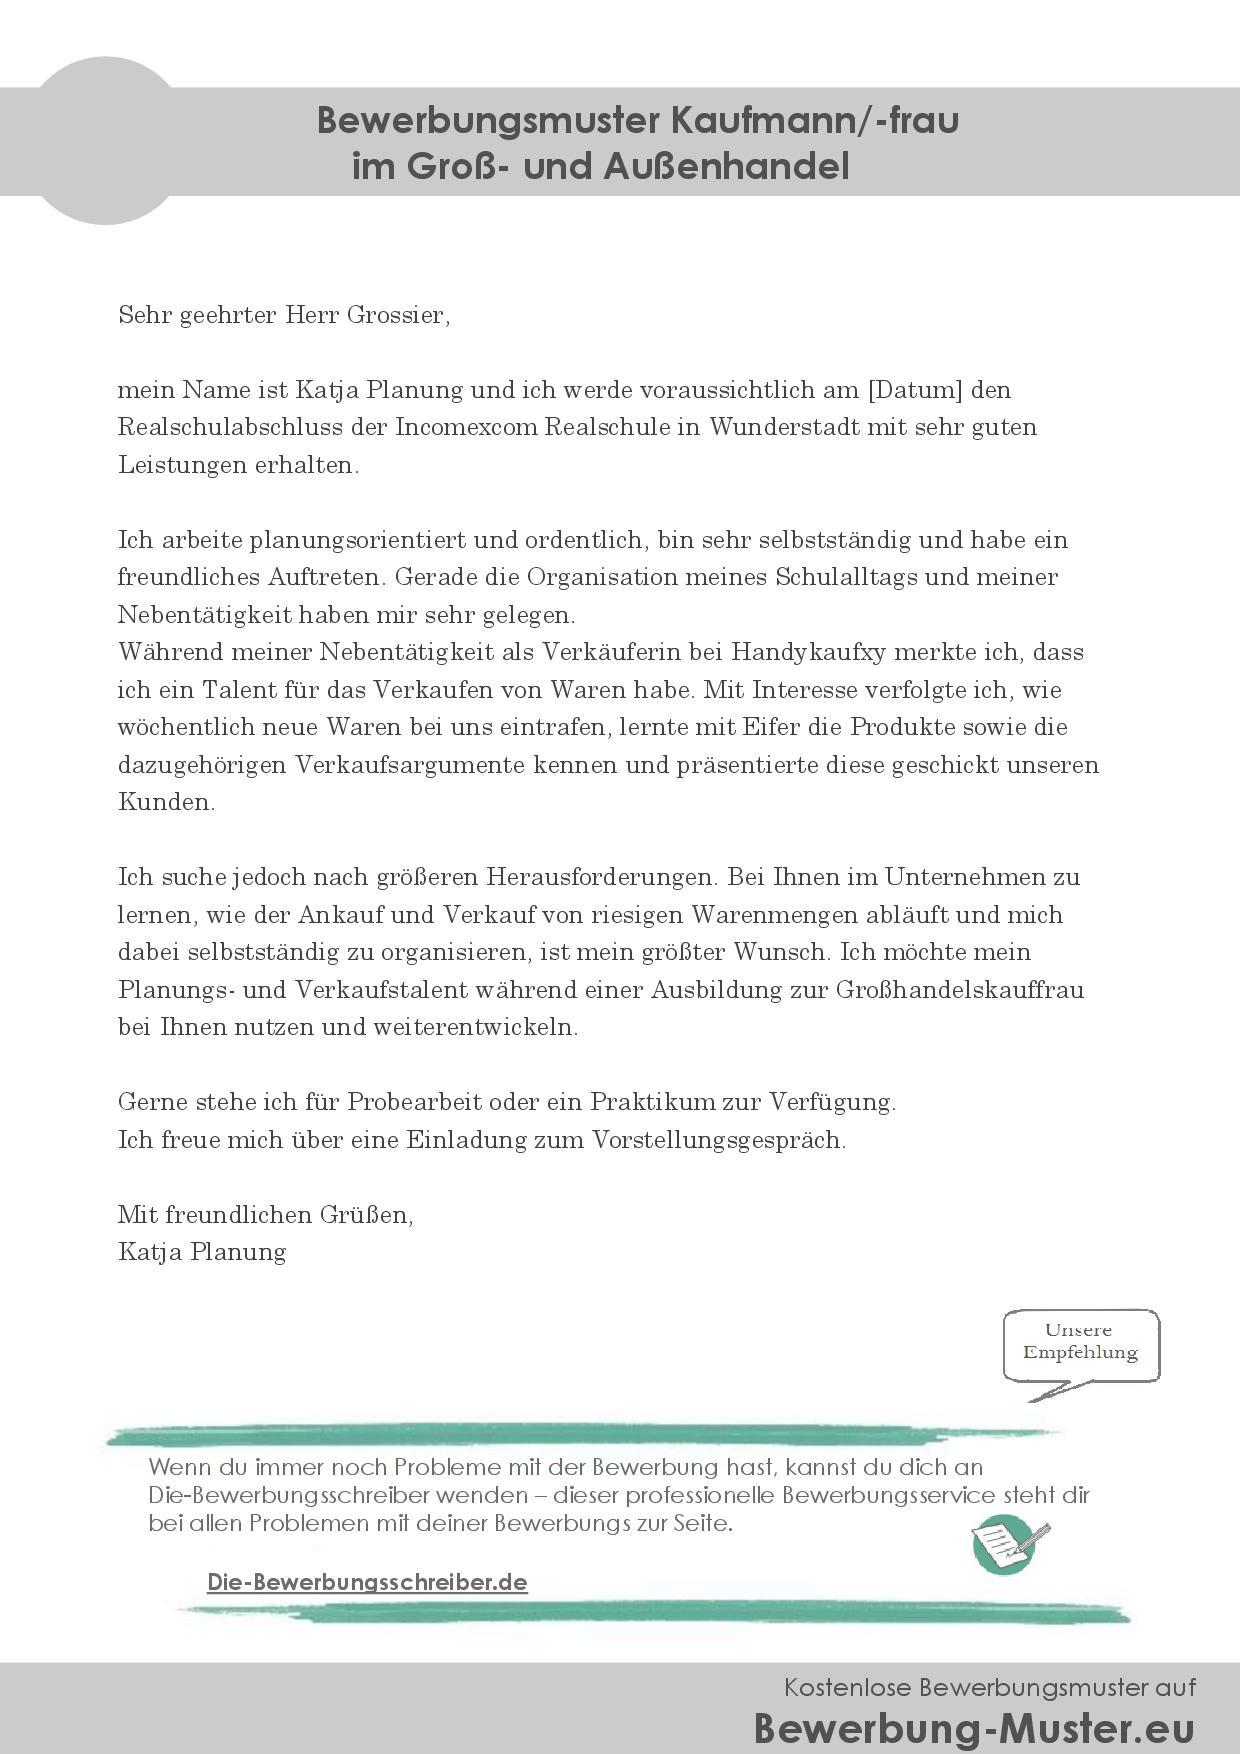 Bewerbung – Kaufmann/Kauffrau